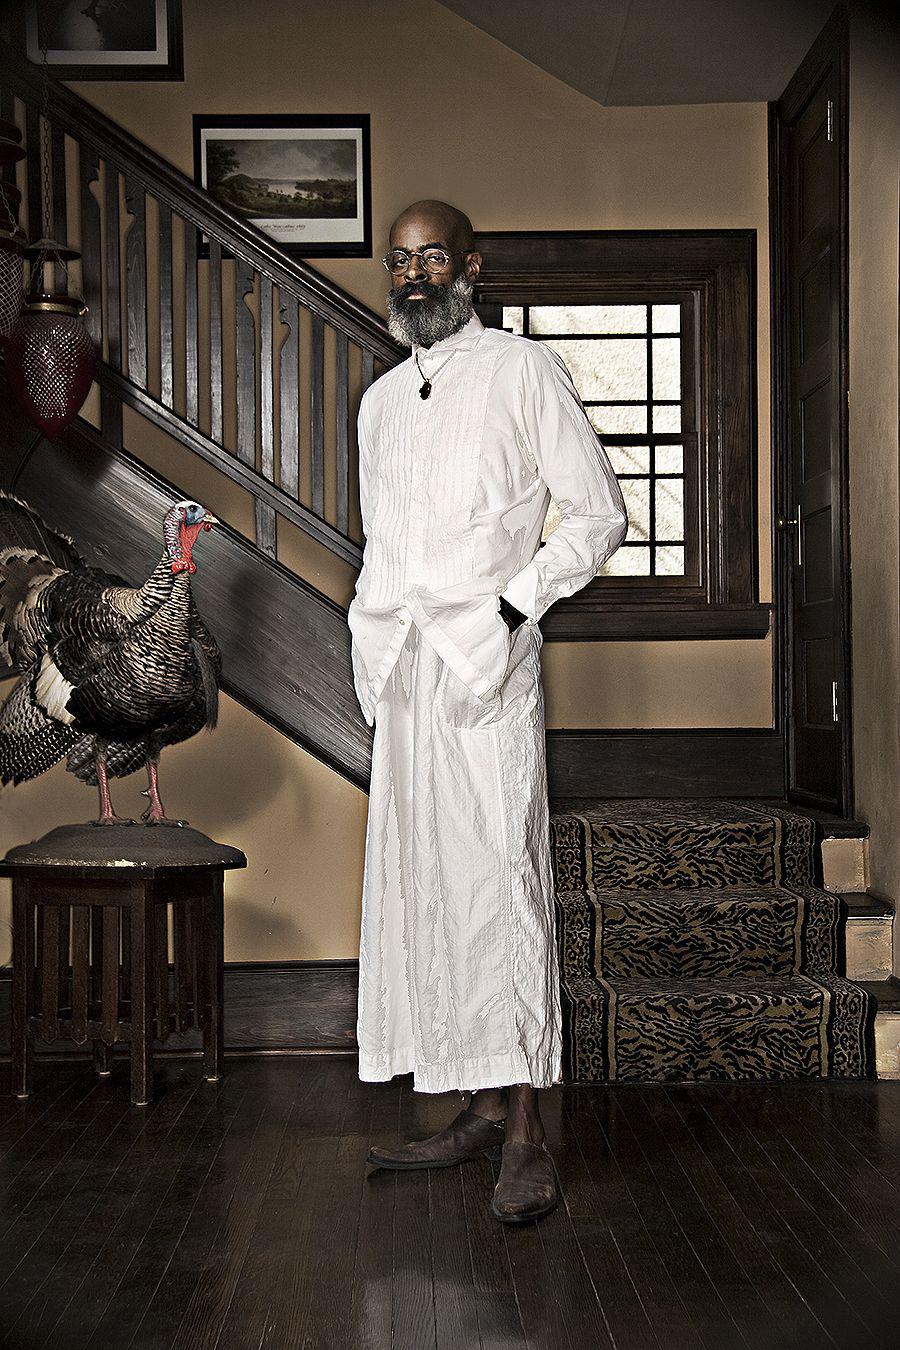 Tony_Ward_Fashion_photography_designer_Kevin_Stewart_Old_School_Shirtmaker_New_York_Staten_Island